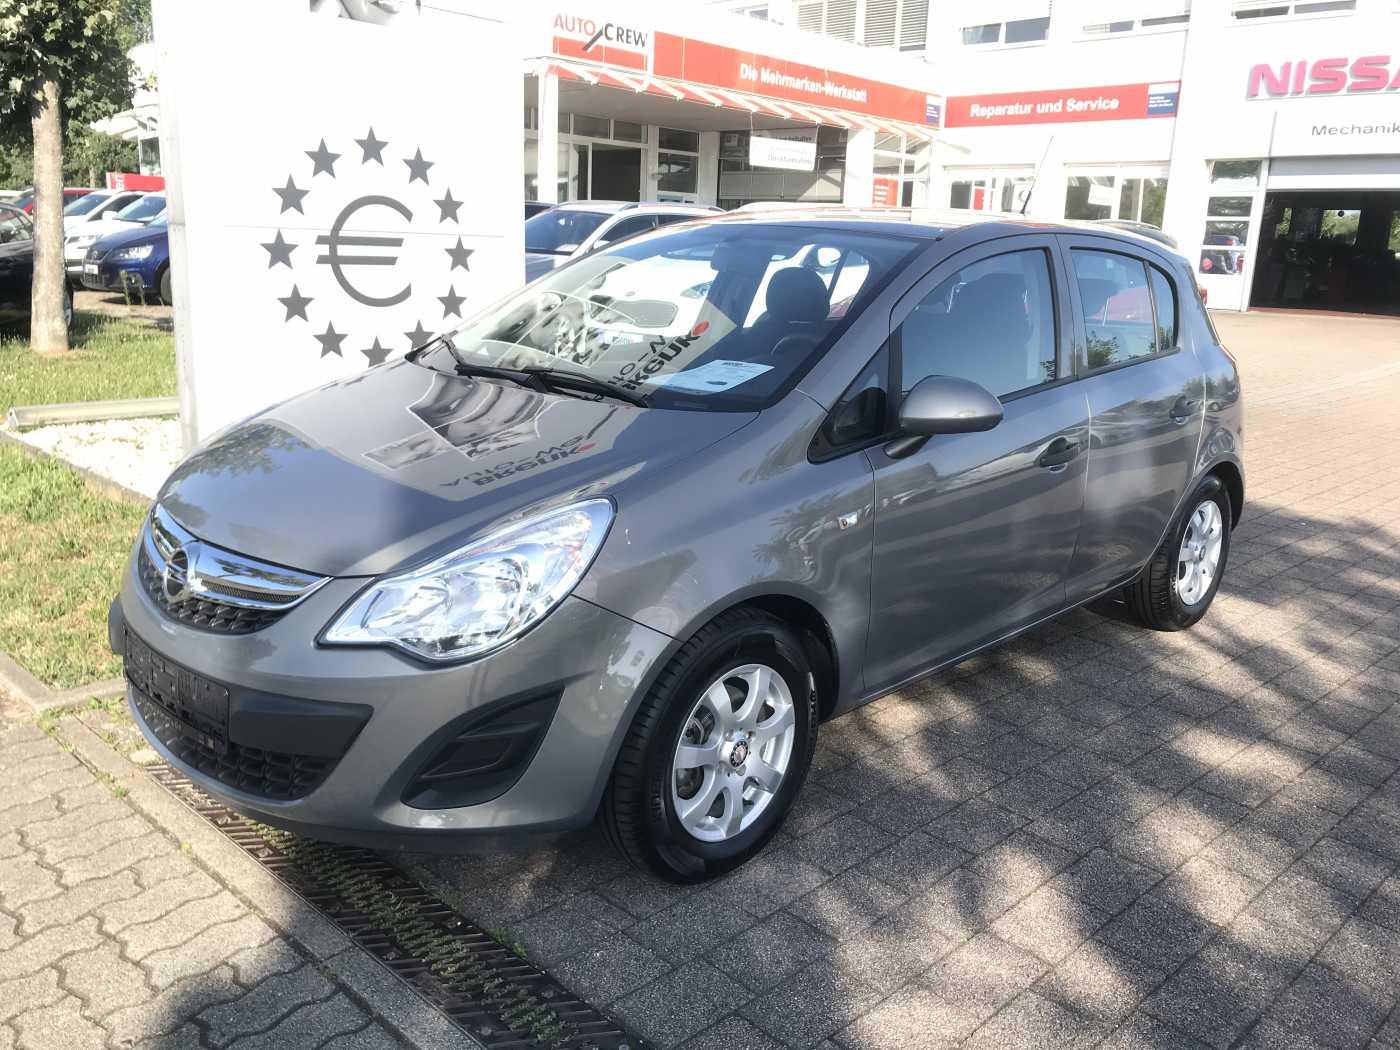 Opel Corsa 1.2 Edition *Klima/ALU/Tempomat*, Jahr 2013, Benzin